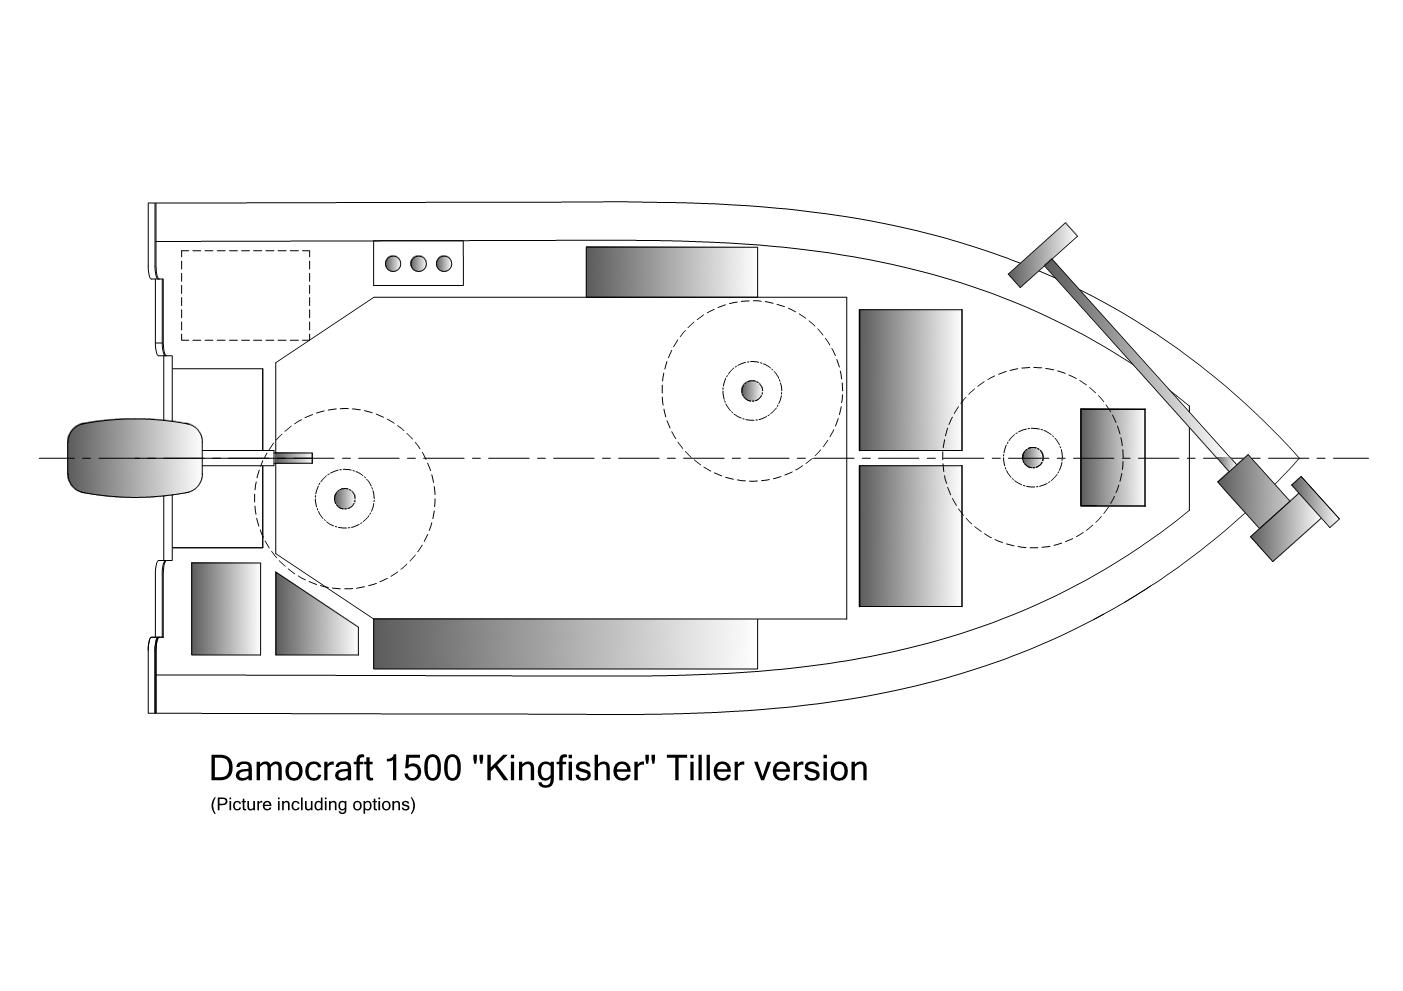 Damocraft 1500 Kingfisher Tiller version